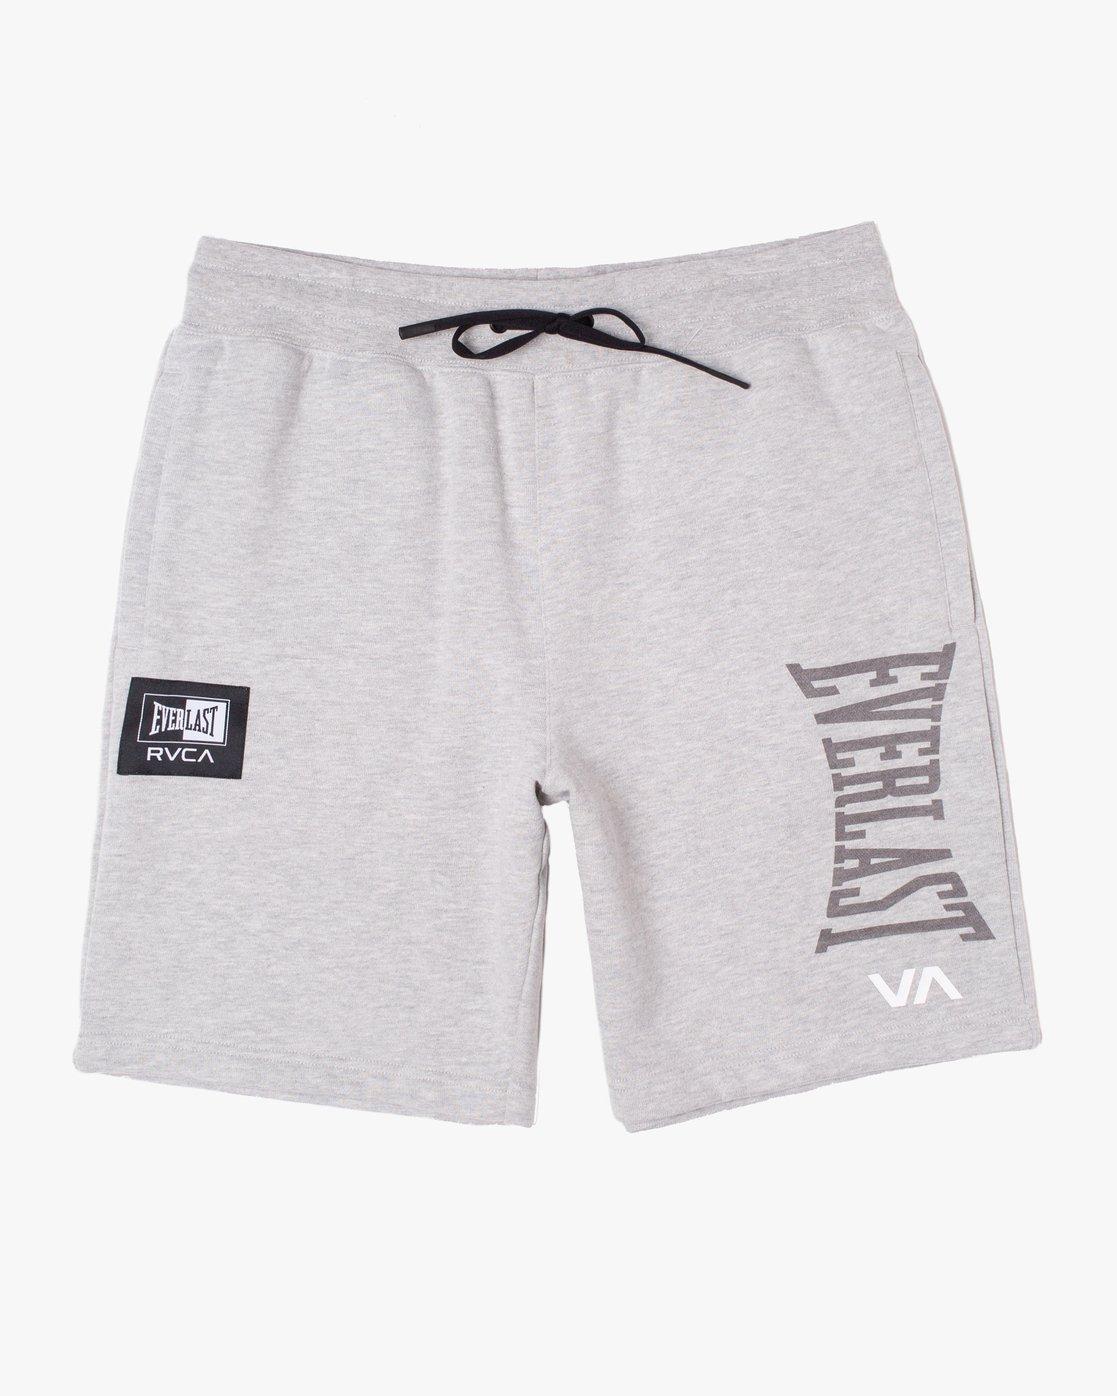 0 Everlast x RVCA - Sweat Shorts for Men Grey W4WKMGRVP1 RVCA